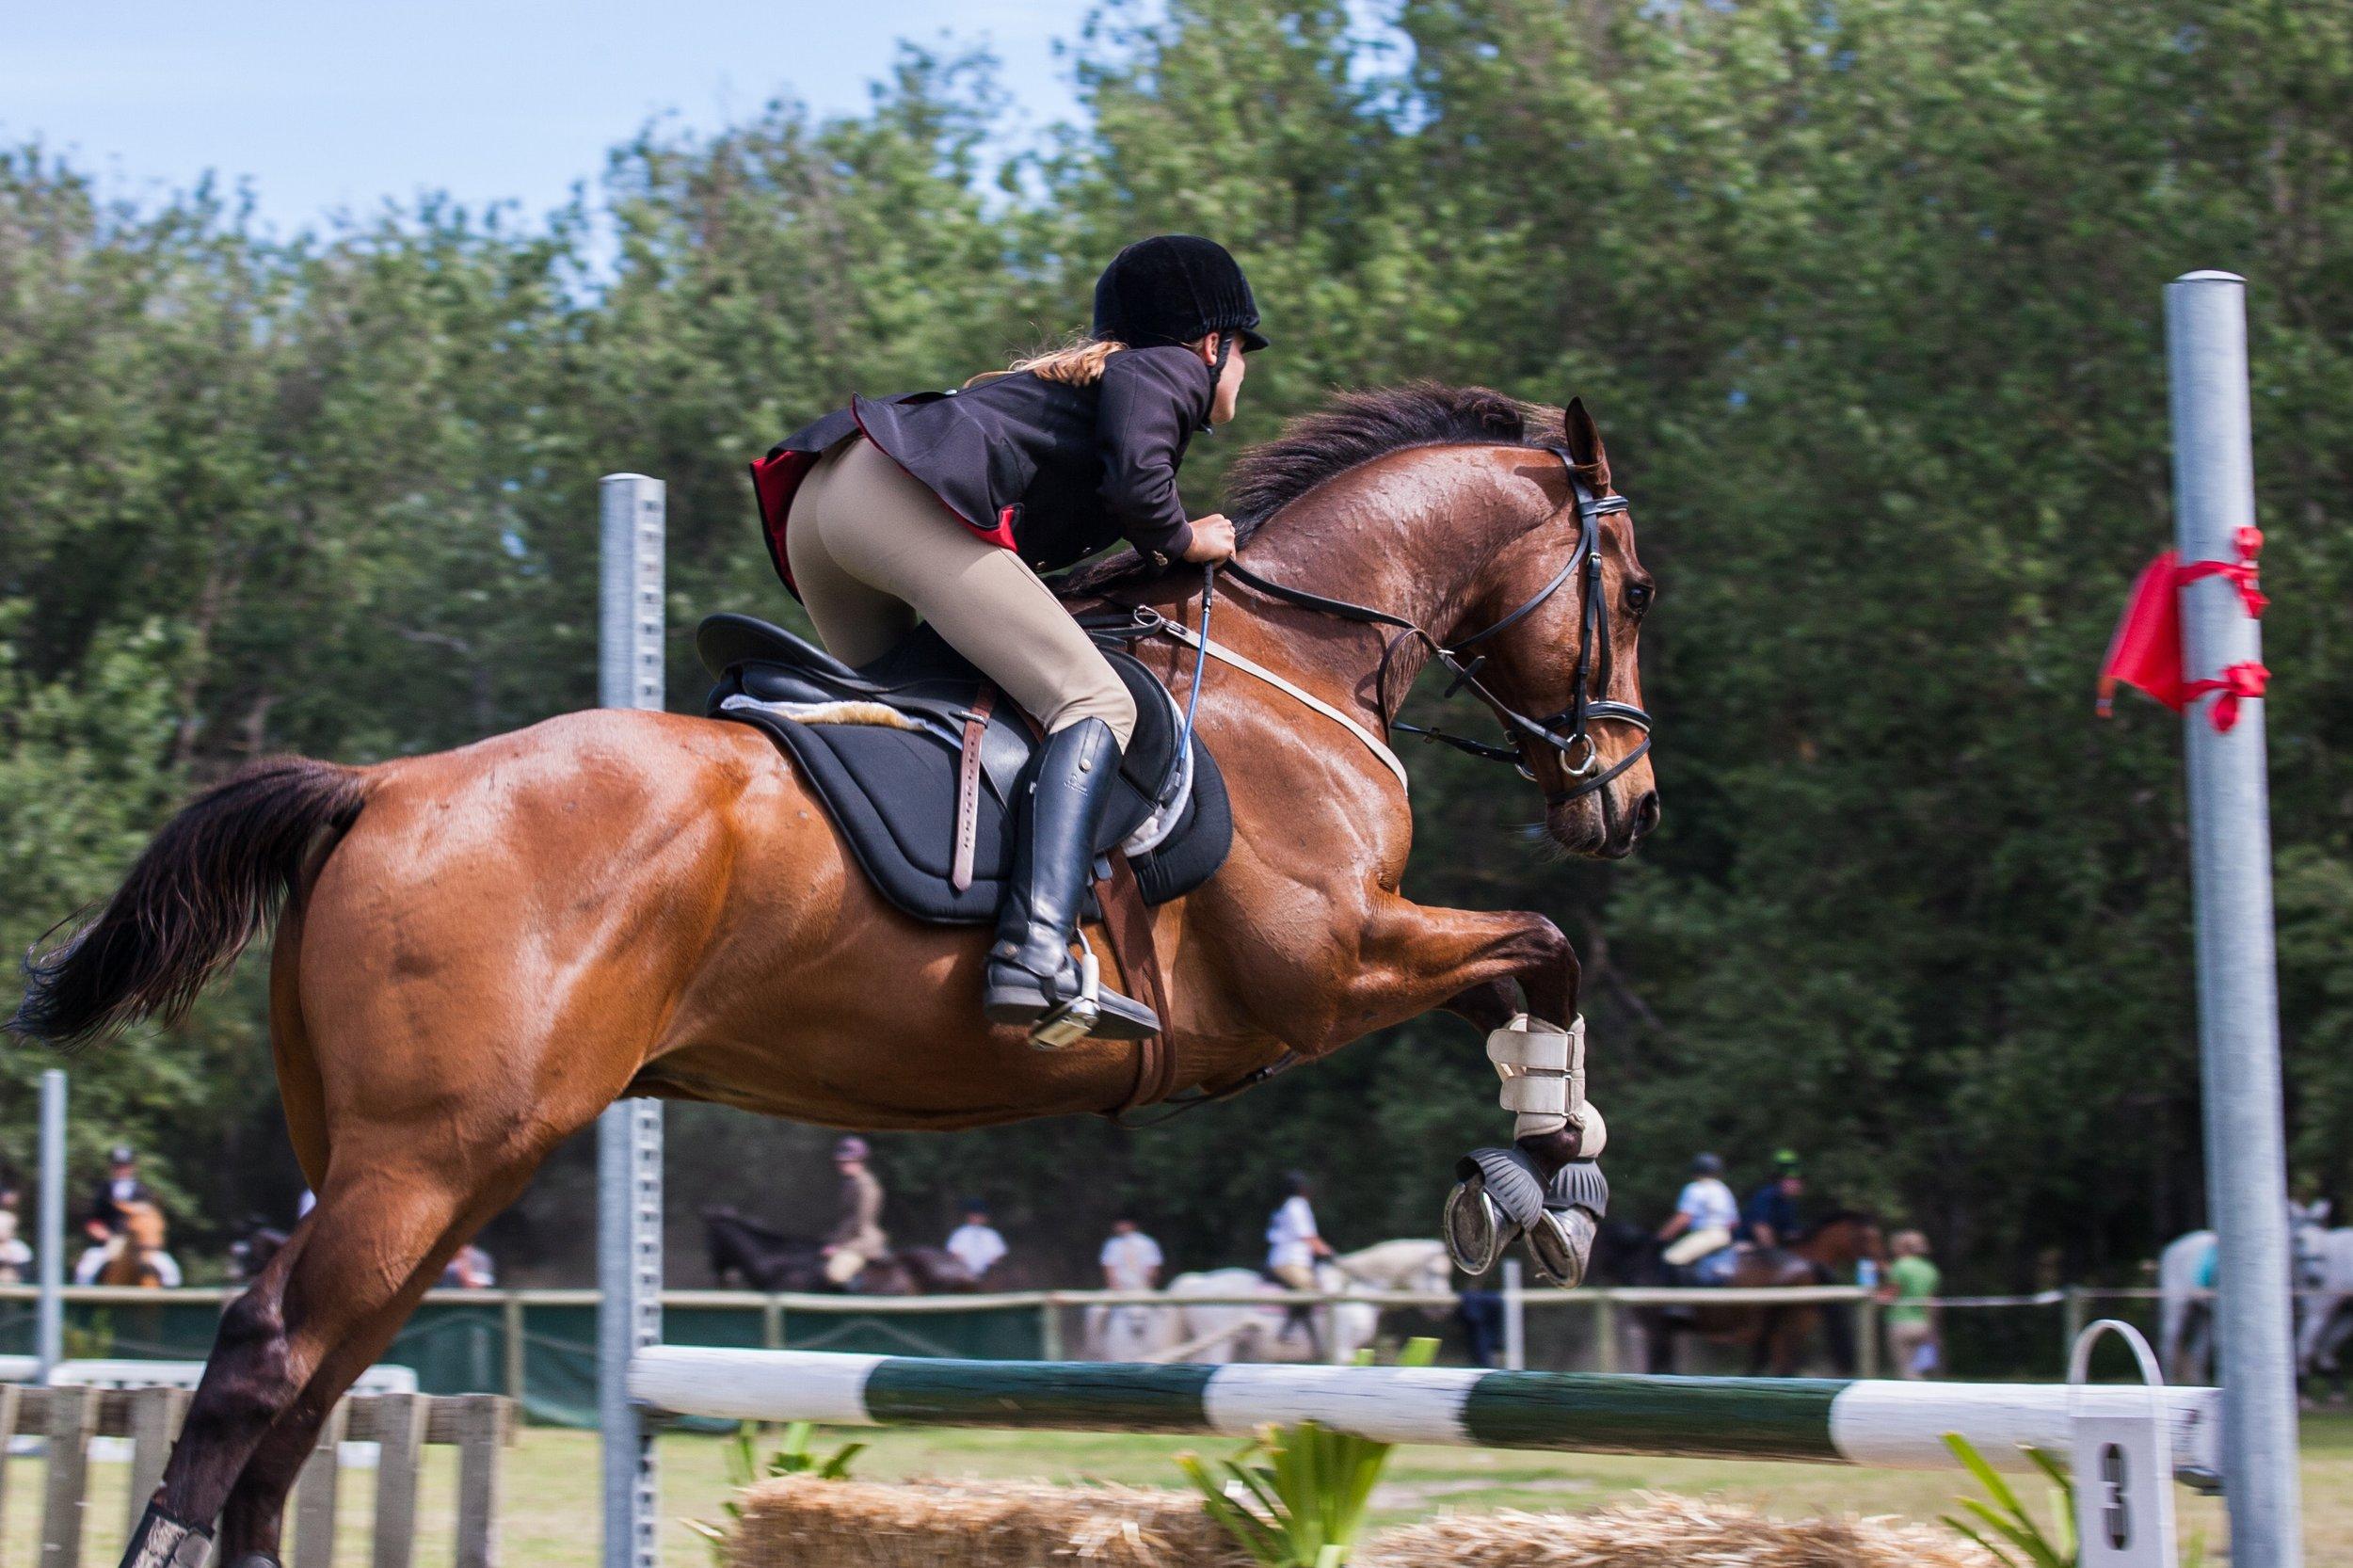 animal-equestrian-equine-1559388.jpg